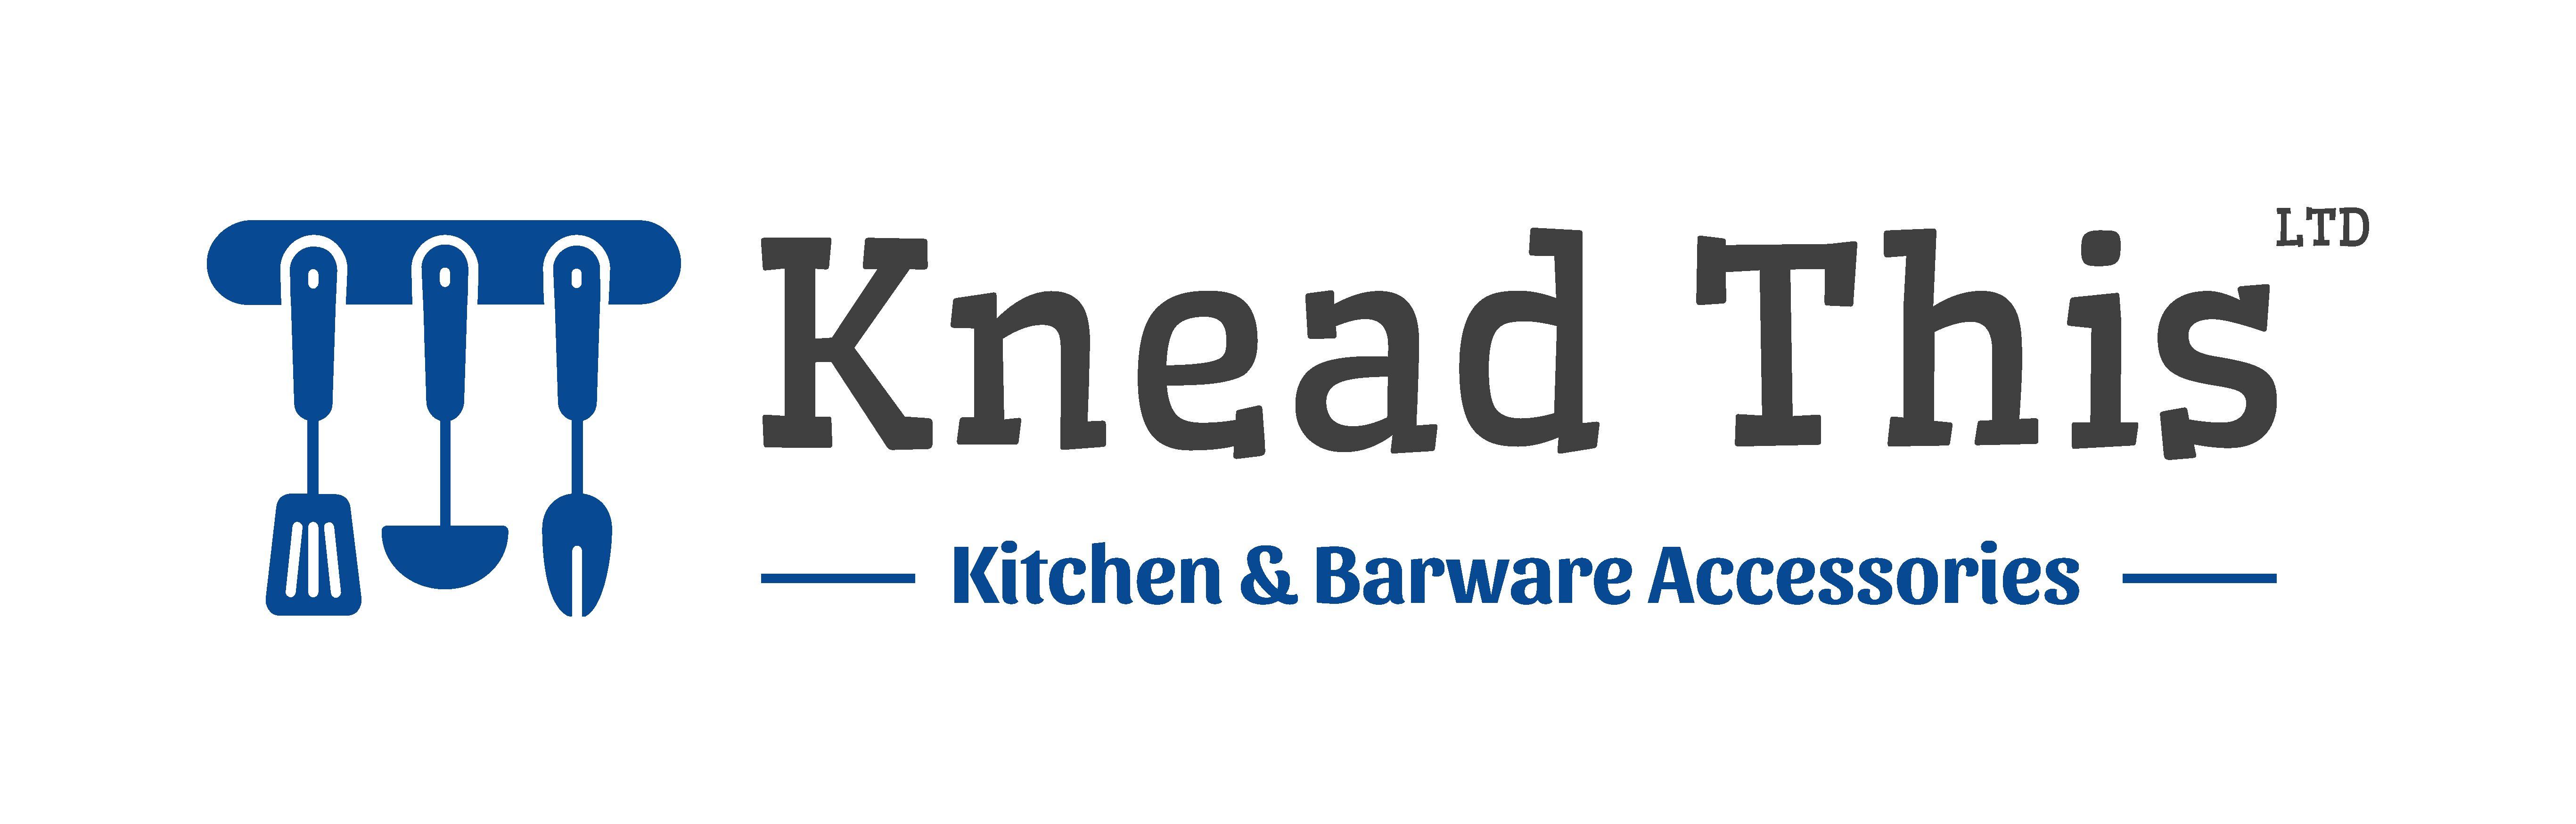 Knead This LTD